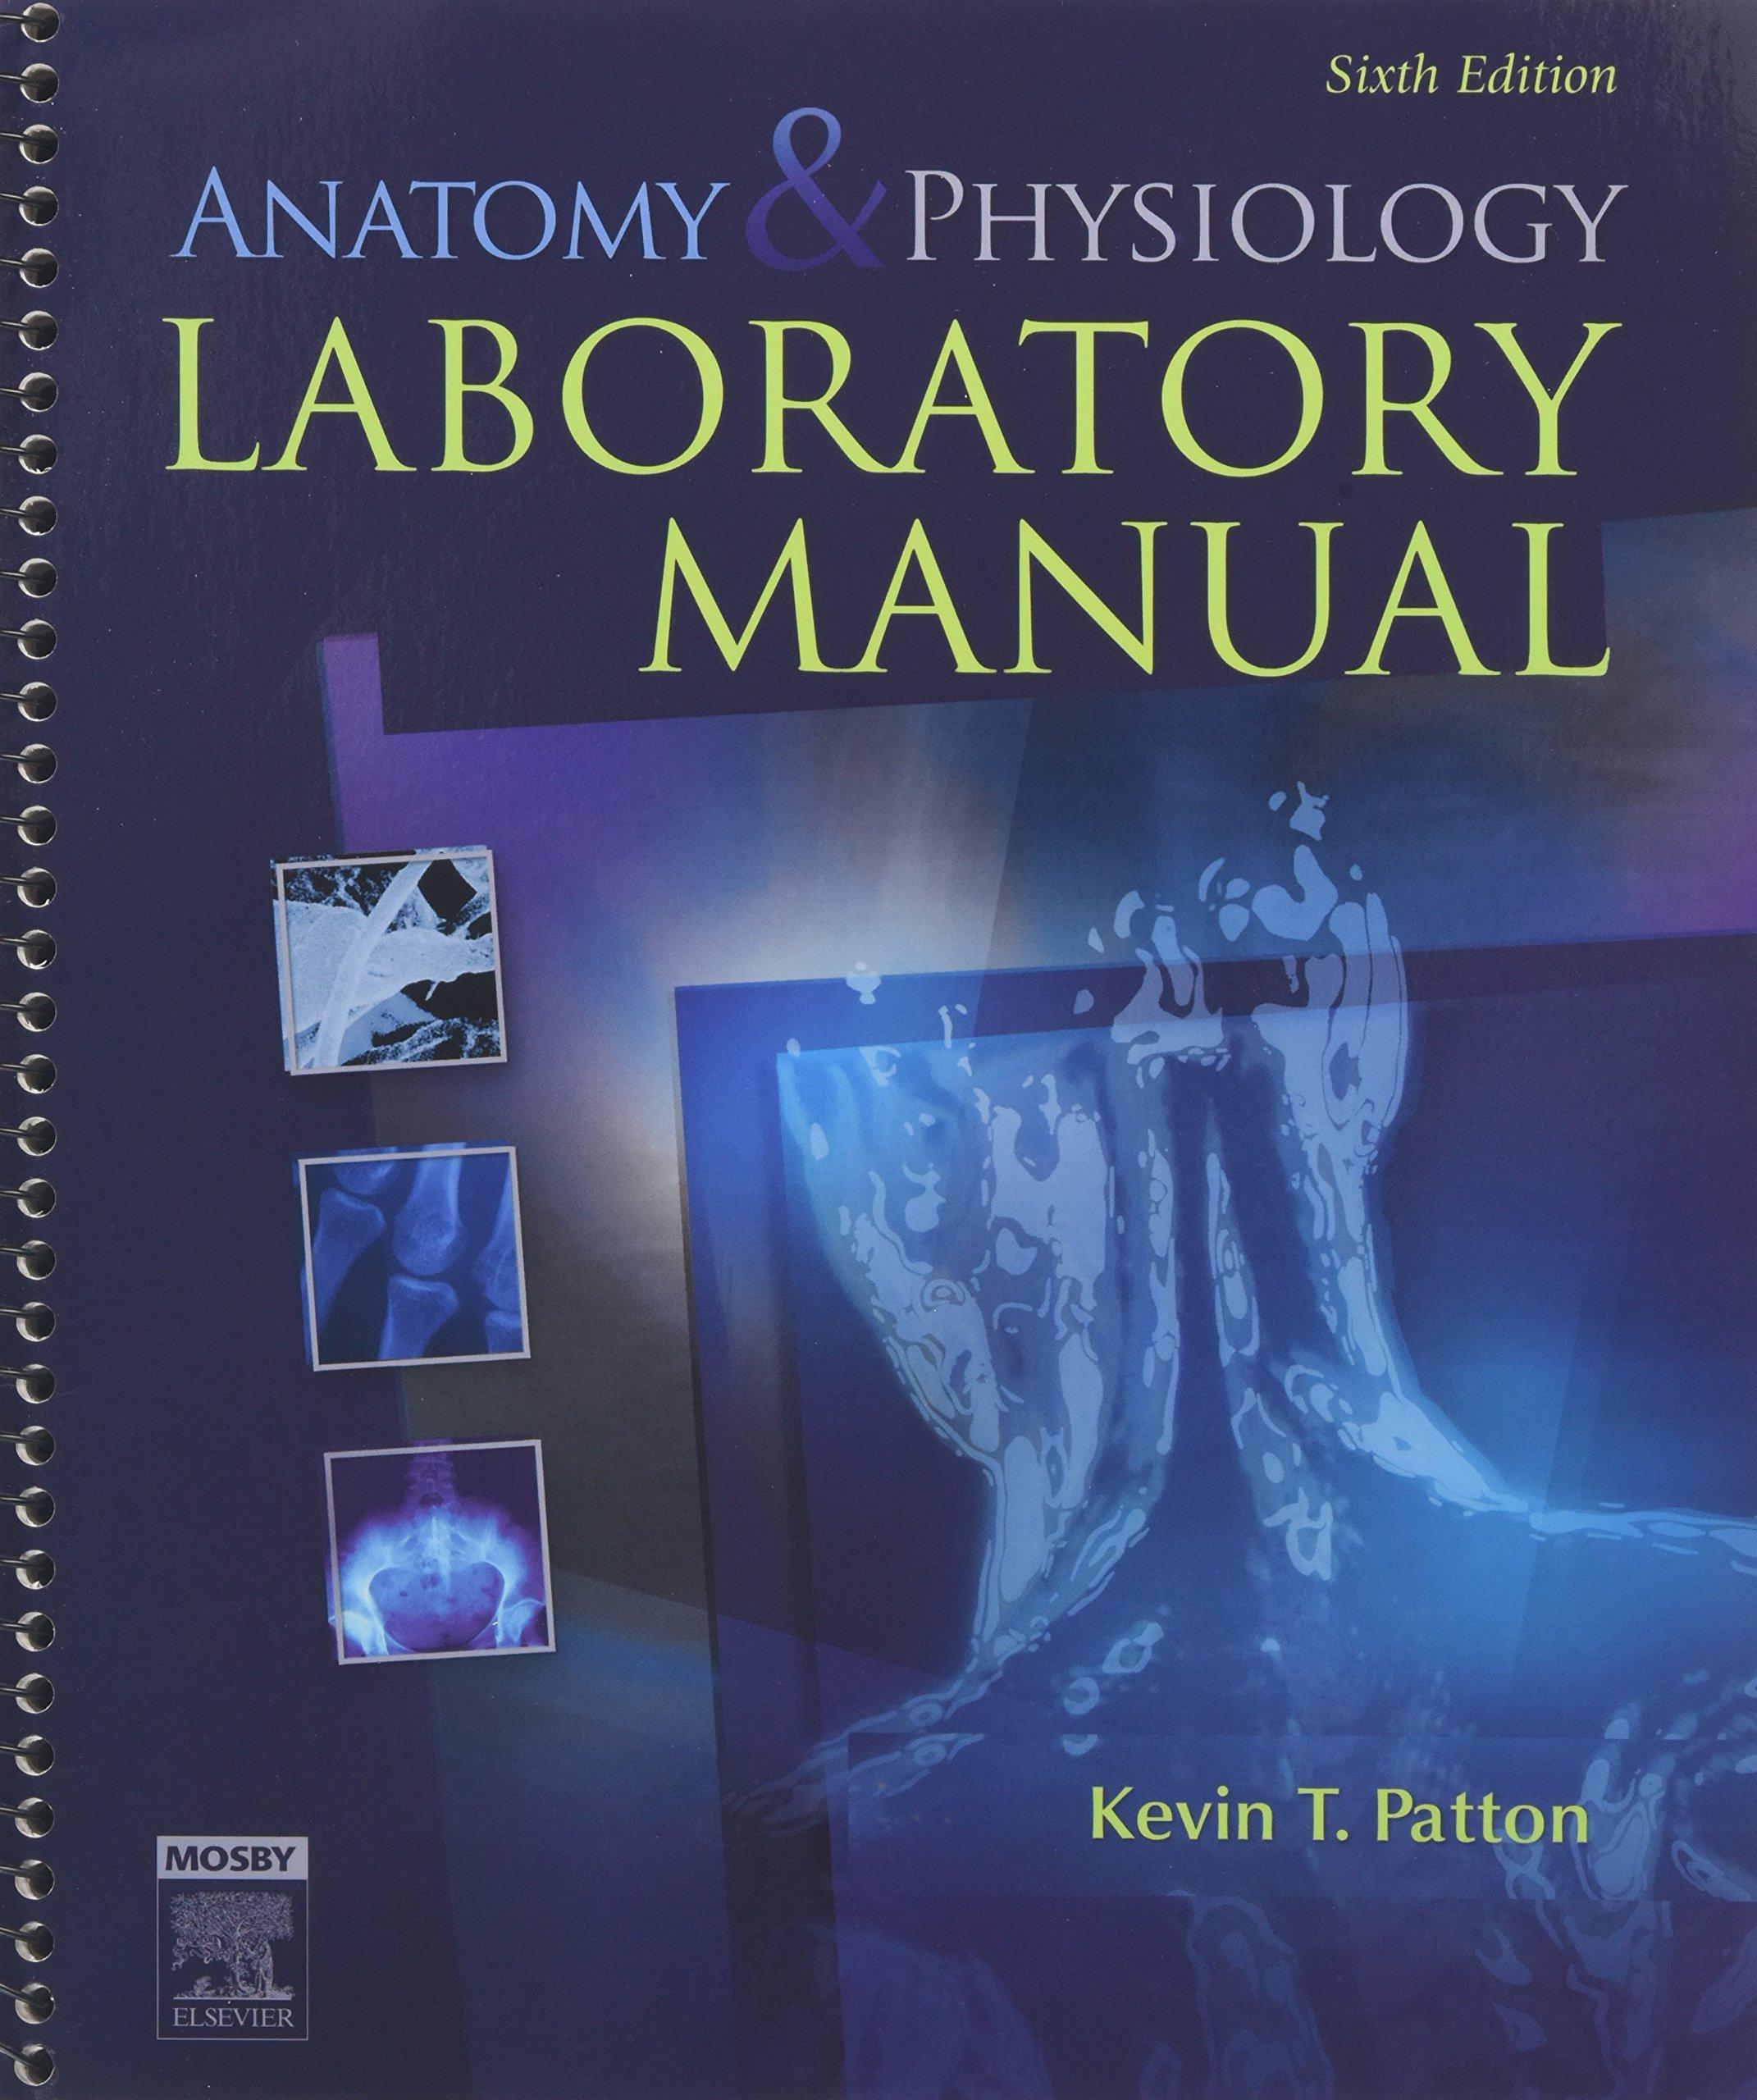 Anatomy & Physiology Laboratory Manual: Amazon.es: Kevin T. Patton ...